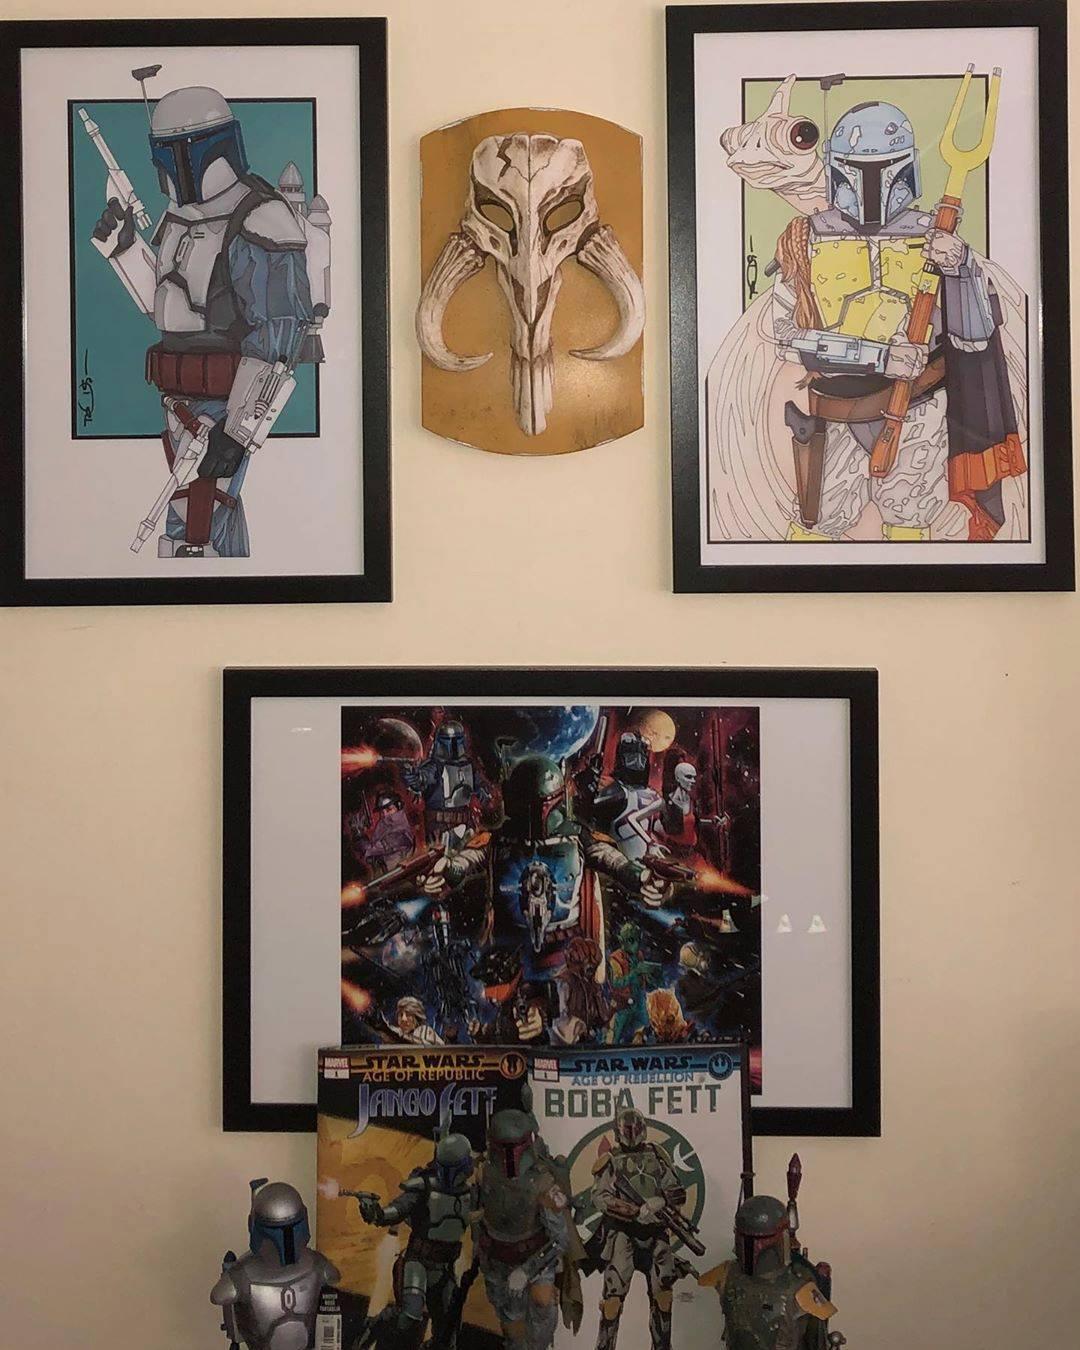 Star Wars Bounty Hunter Armor Empire Strikes Back Studio Wall Art